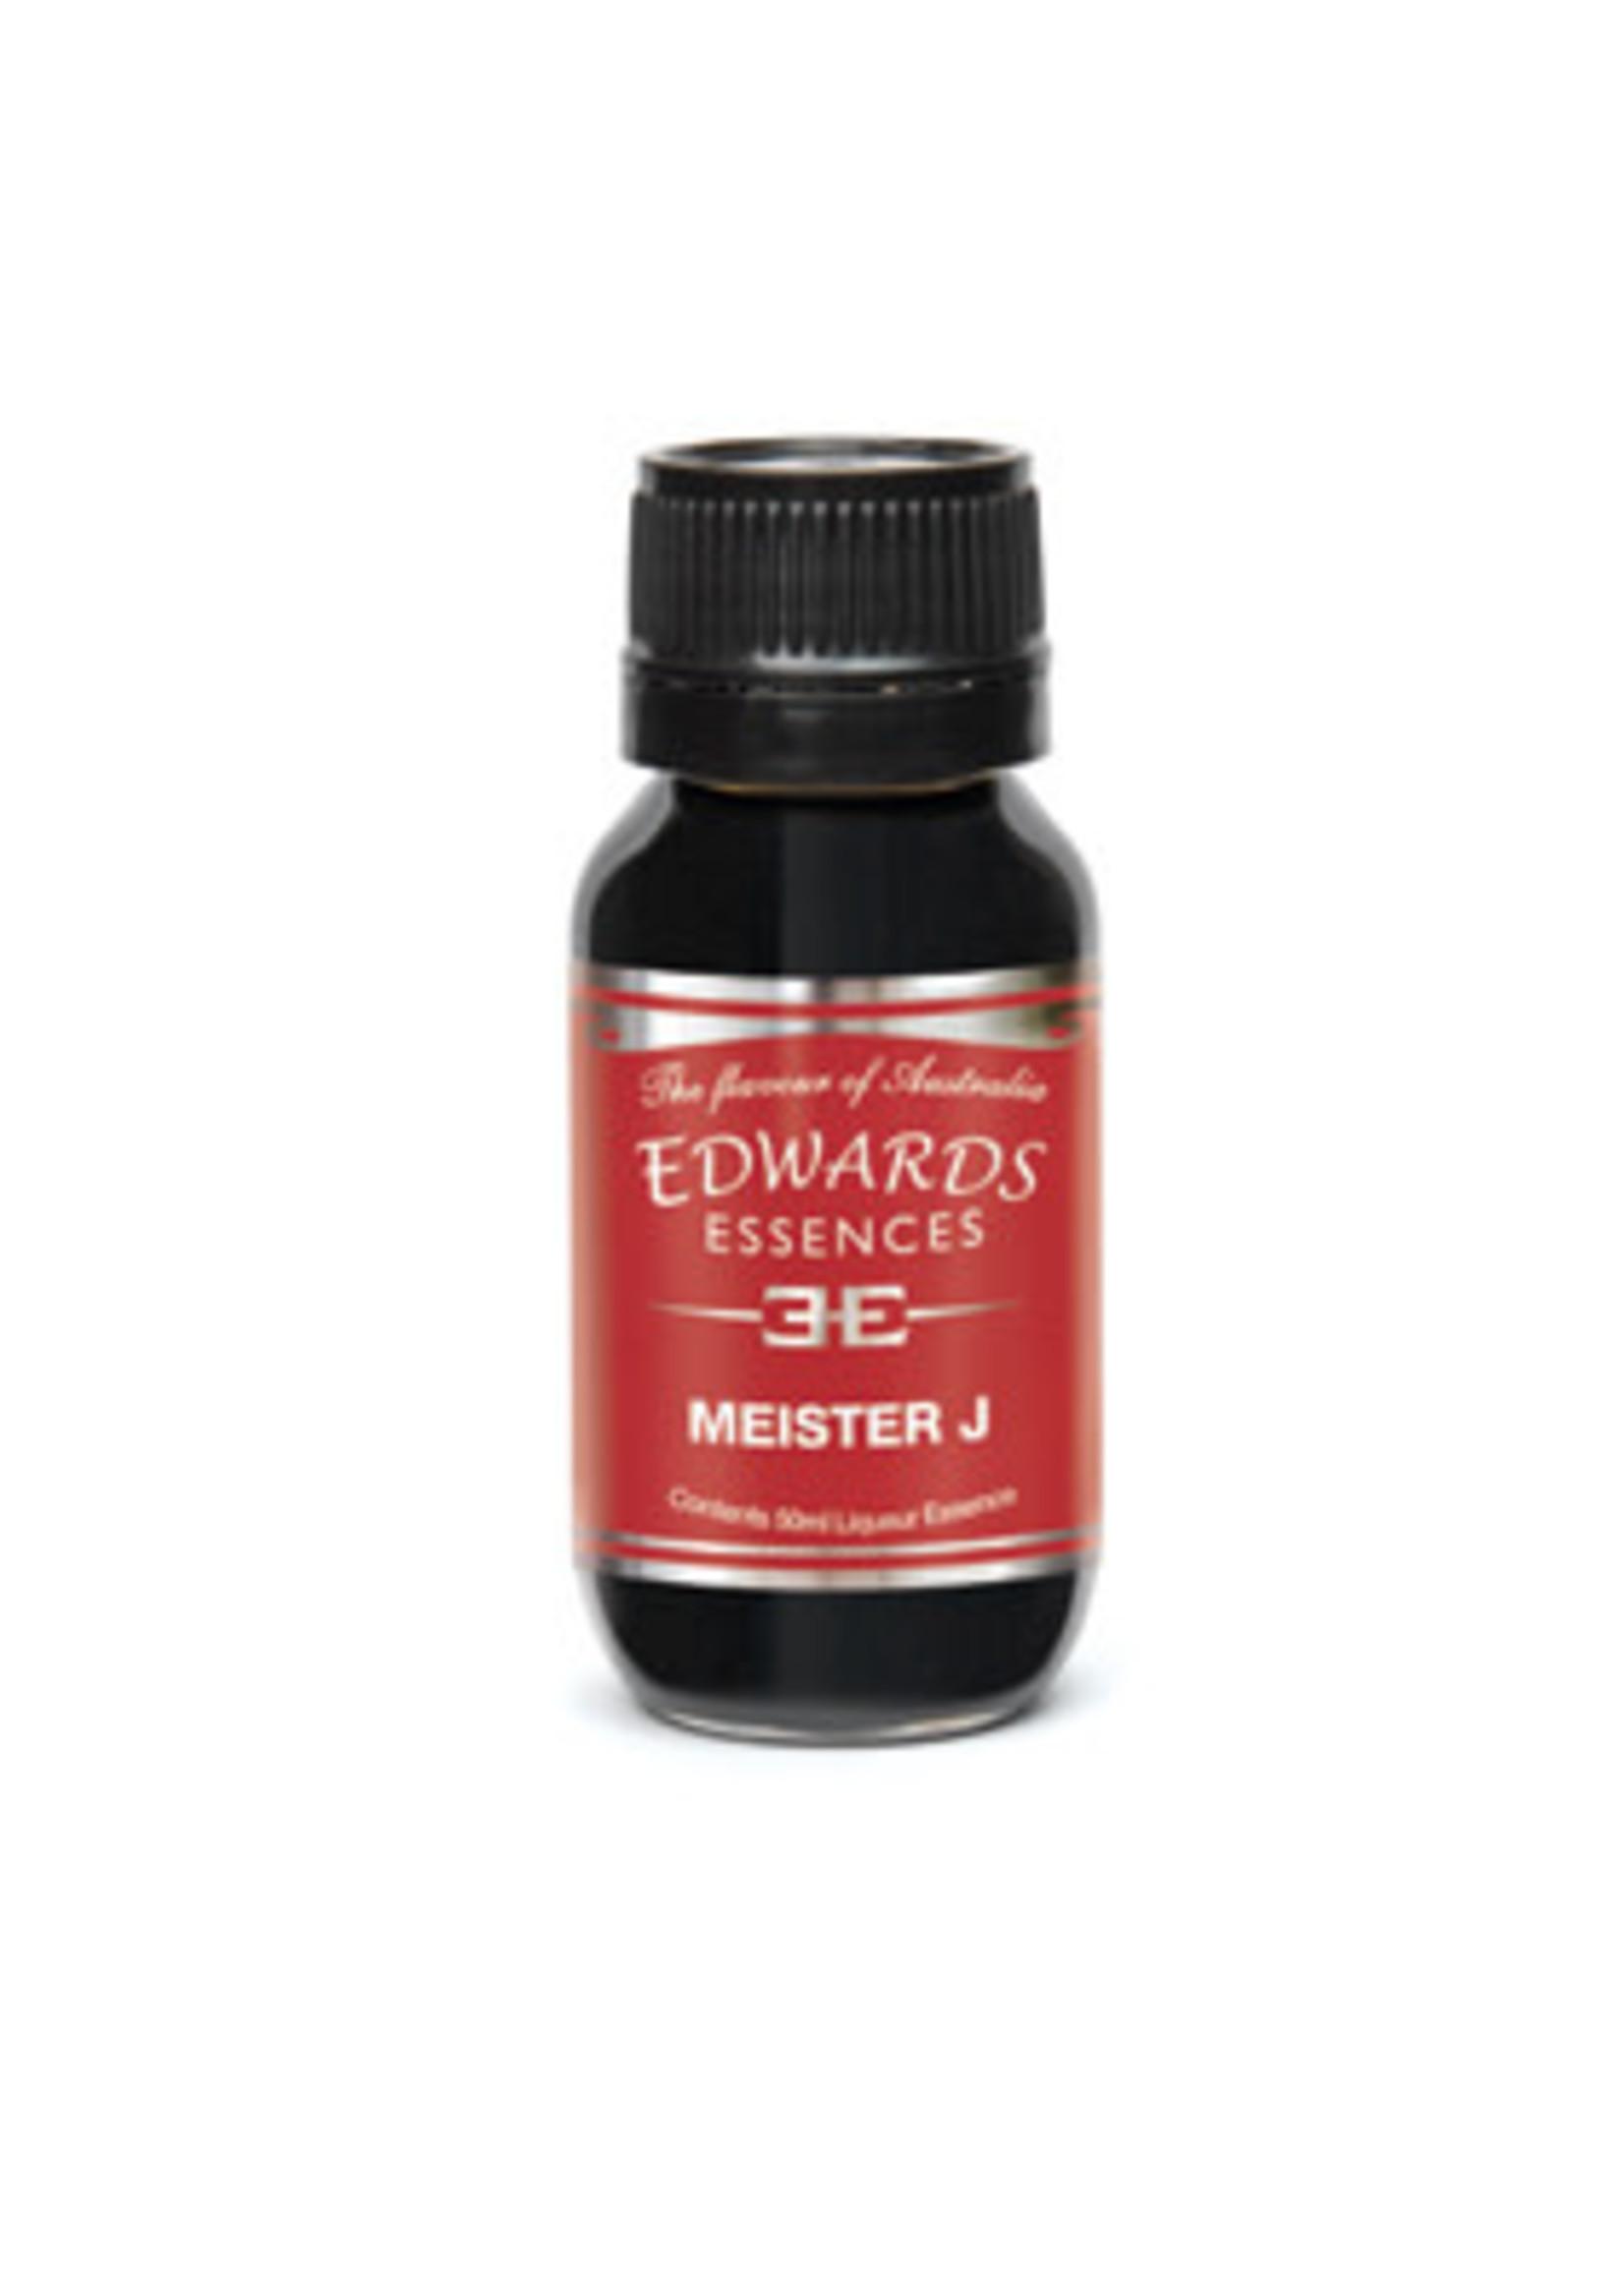 Edwards Essences Edwards Essences Meister J 50ml